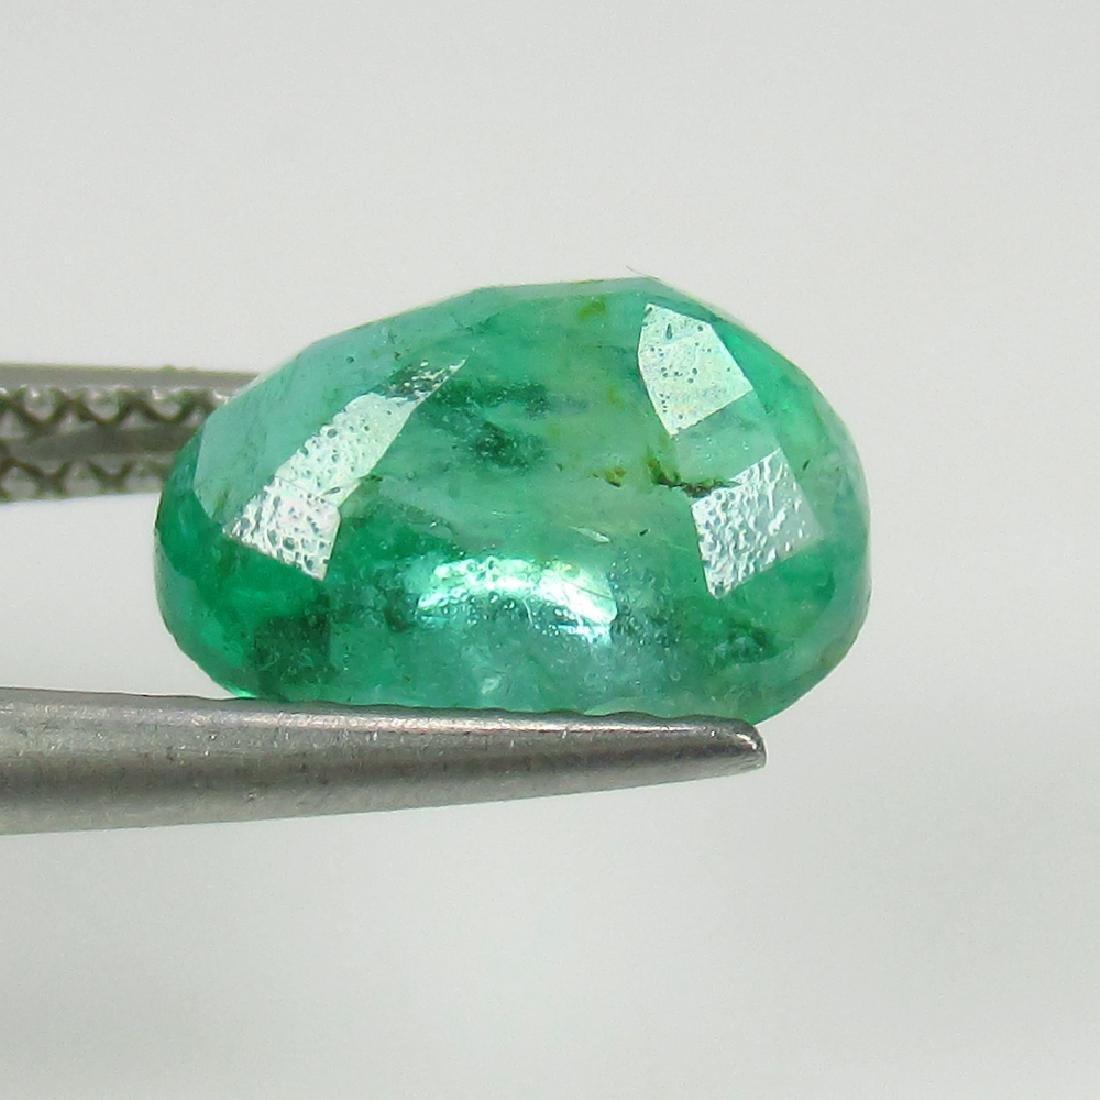 2.06 Ct IGI Certified Genuine Zambian Emerald Nice Oval - 3